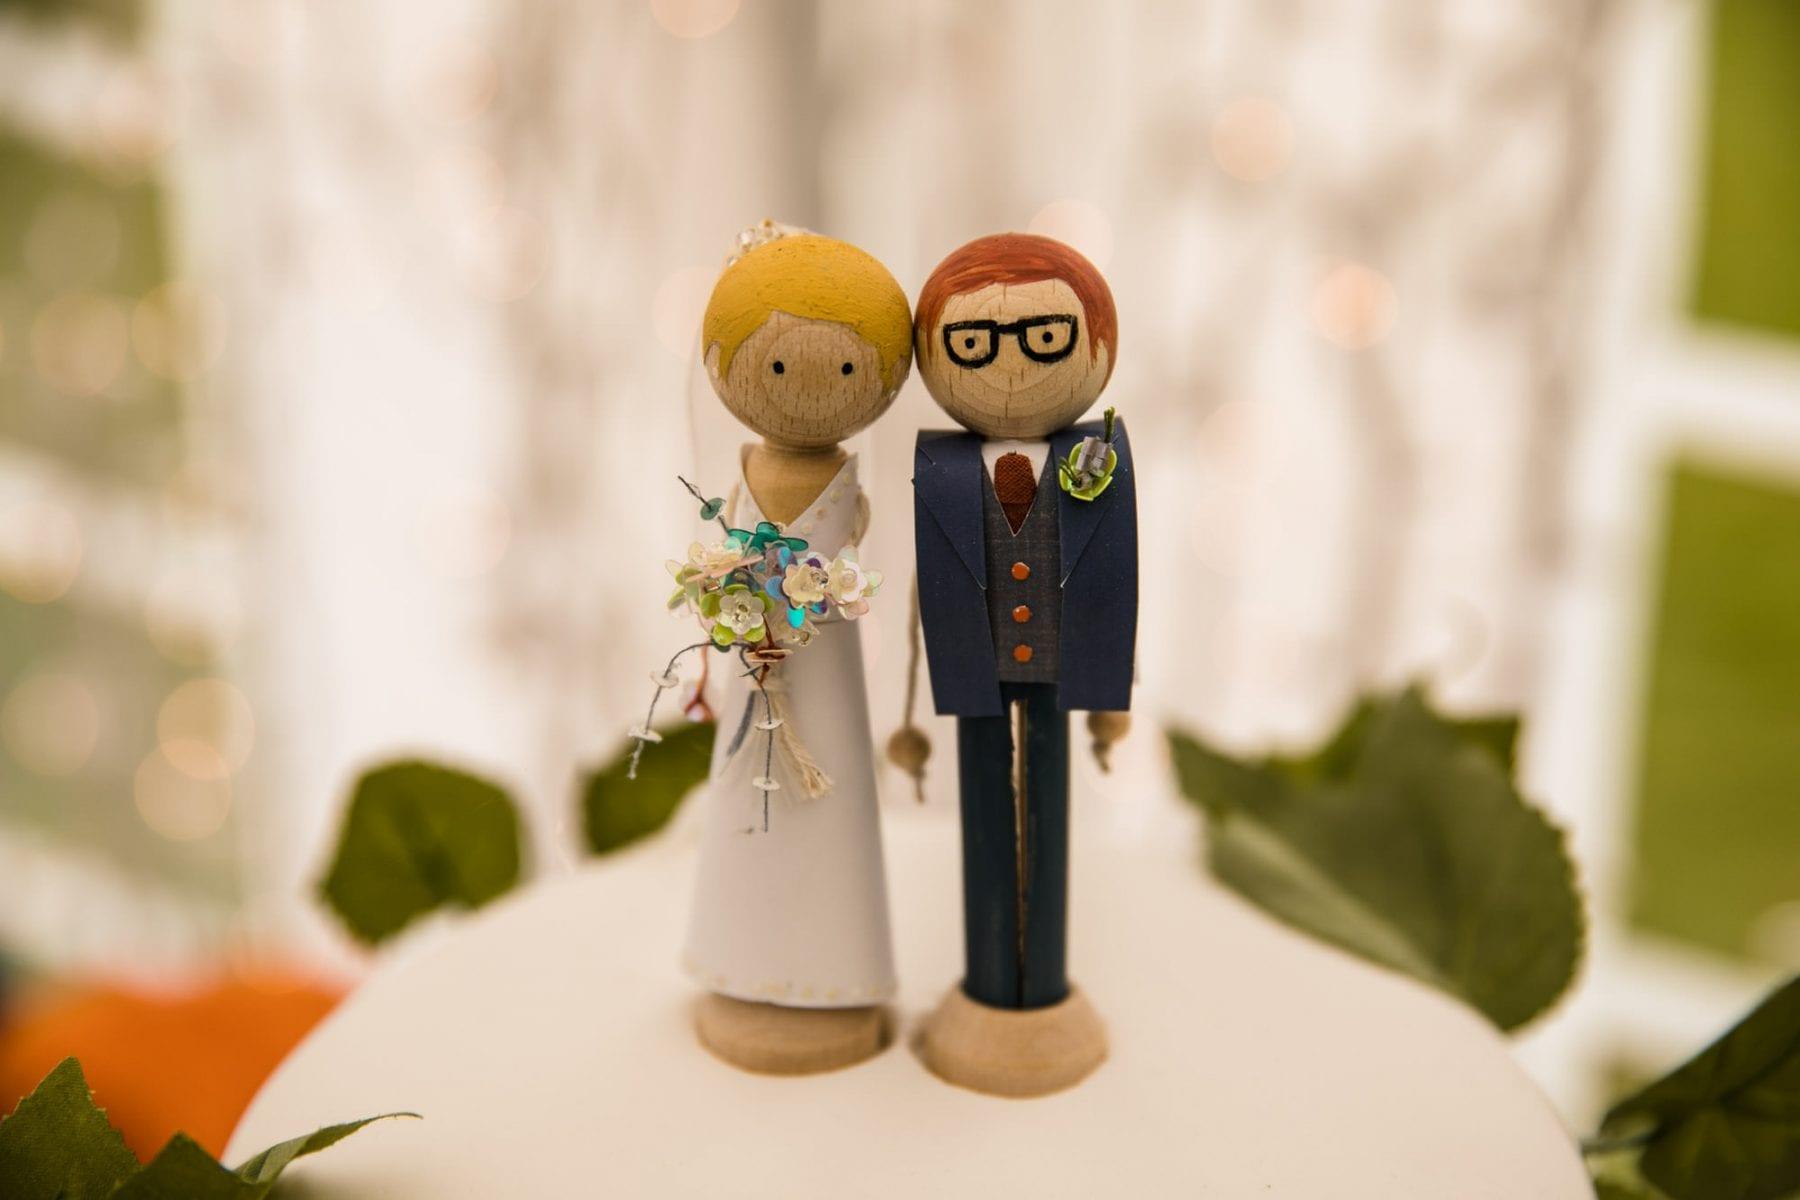 Peg bride groom cake toppers